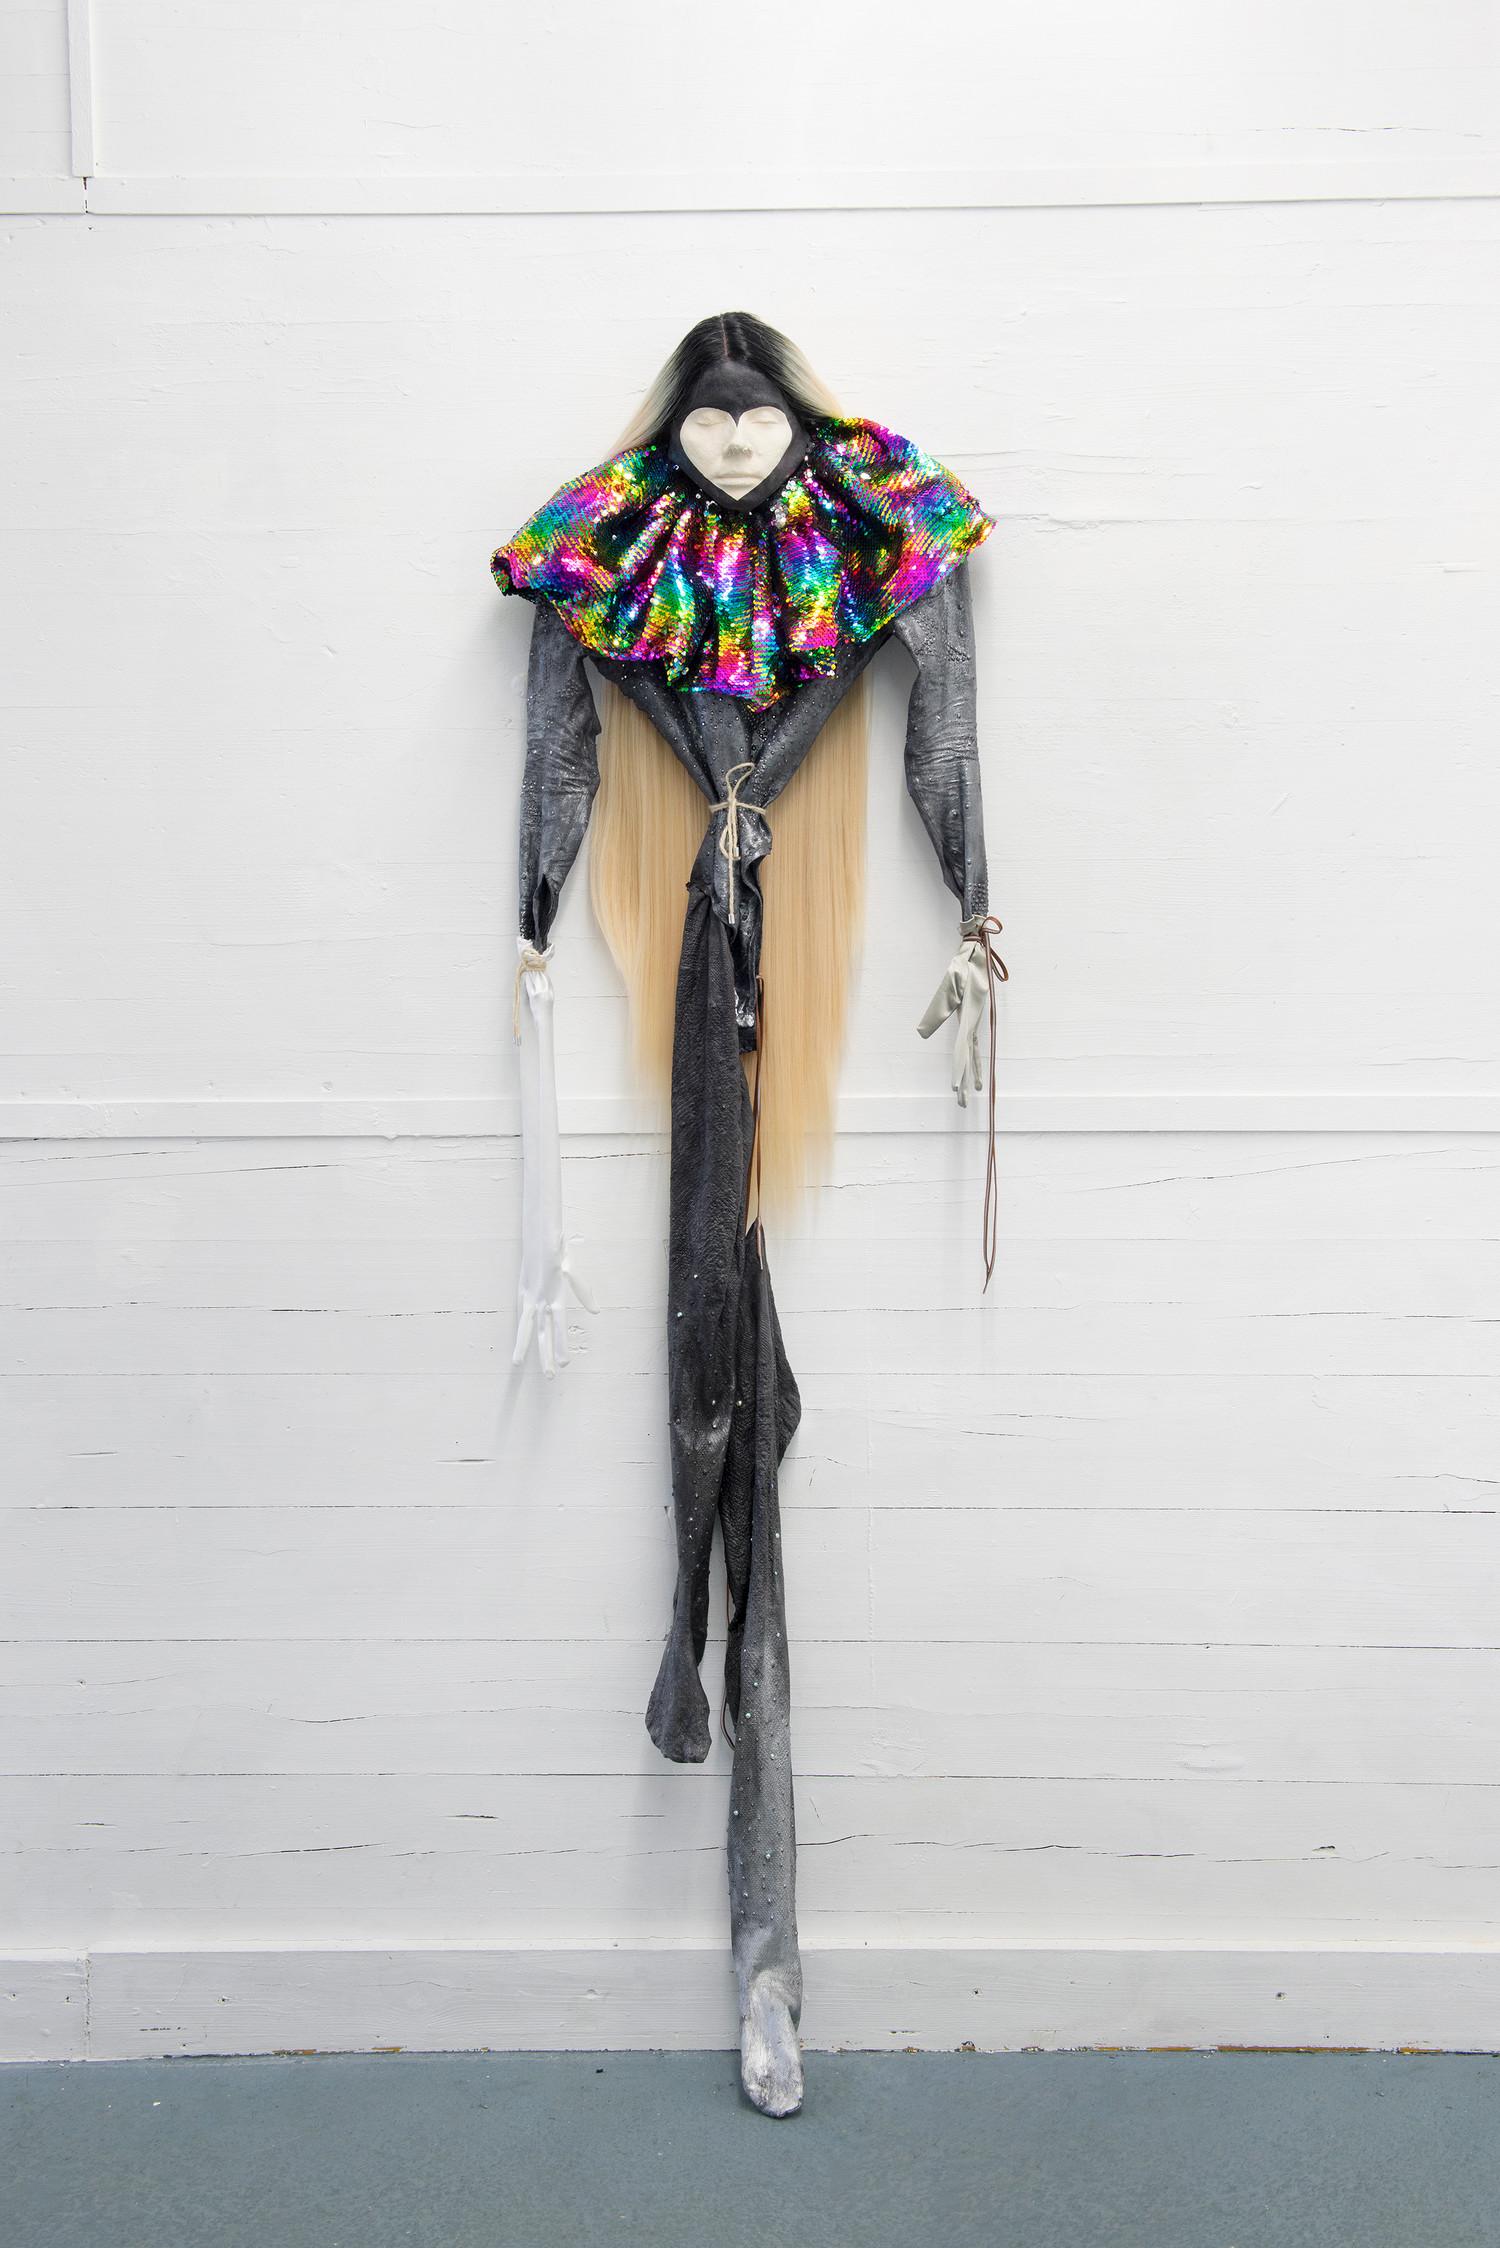 Clown, 2020, latex, textile, wig, sequins, pigment, acrylic, rope, circa 188 x 54 x 15 cm — © Manon Wertenbroek